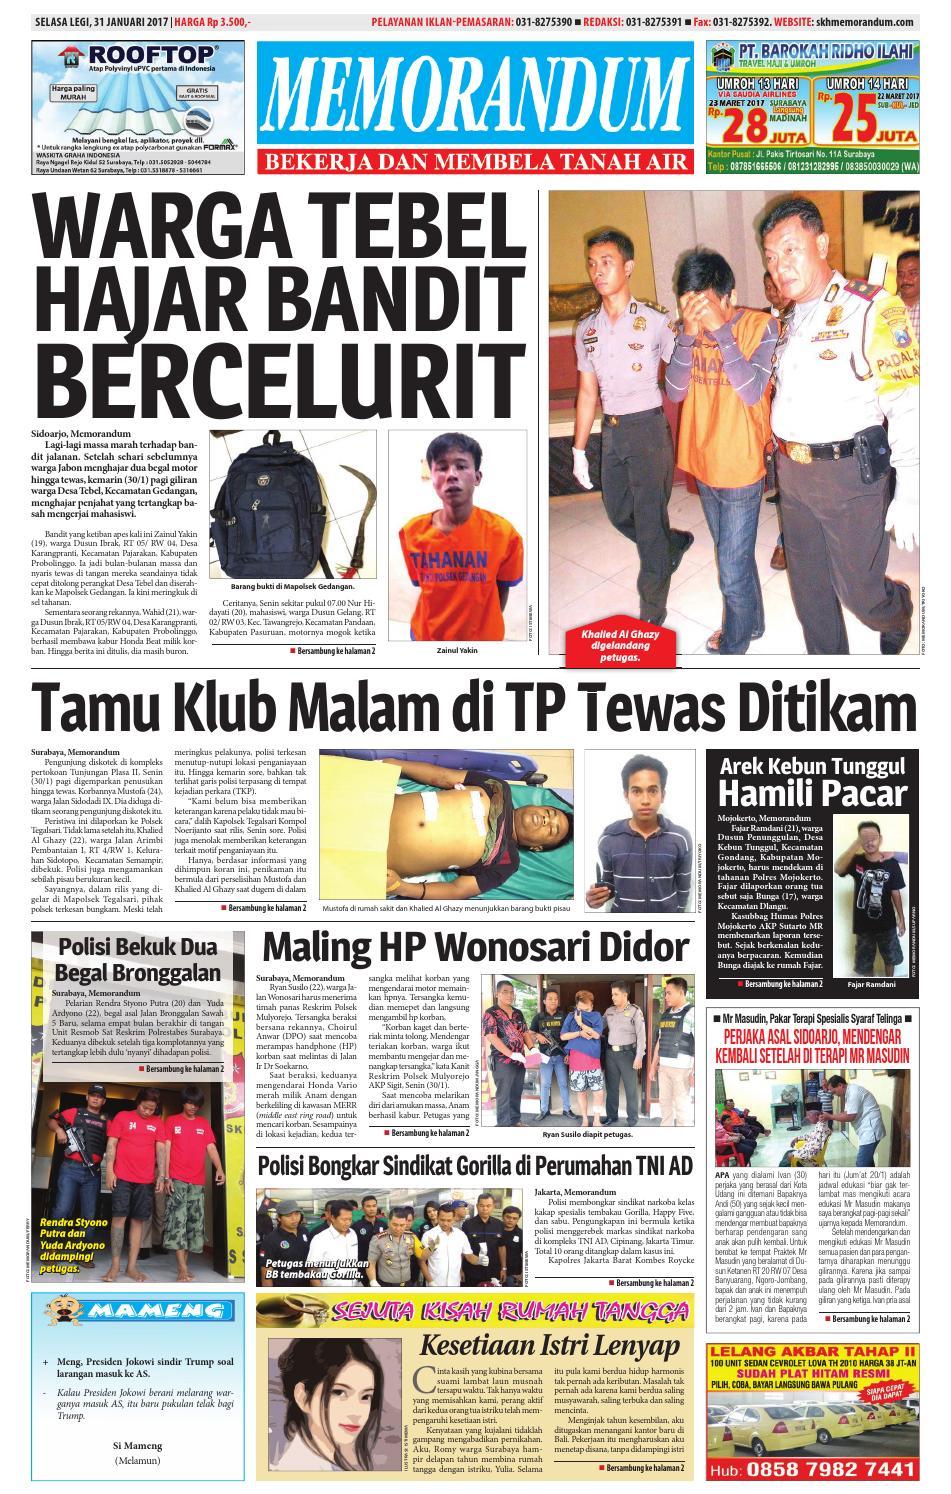 Memorandum Edisi 31 Januari 2017 By Issuu Fcenter Meja Belajar Sd Hk 9004 Sh Jawa Tengah